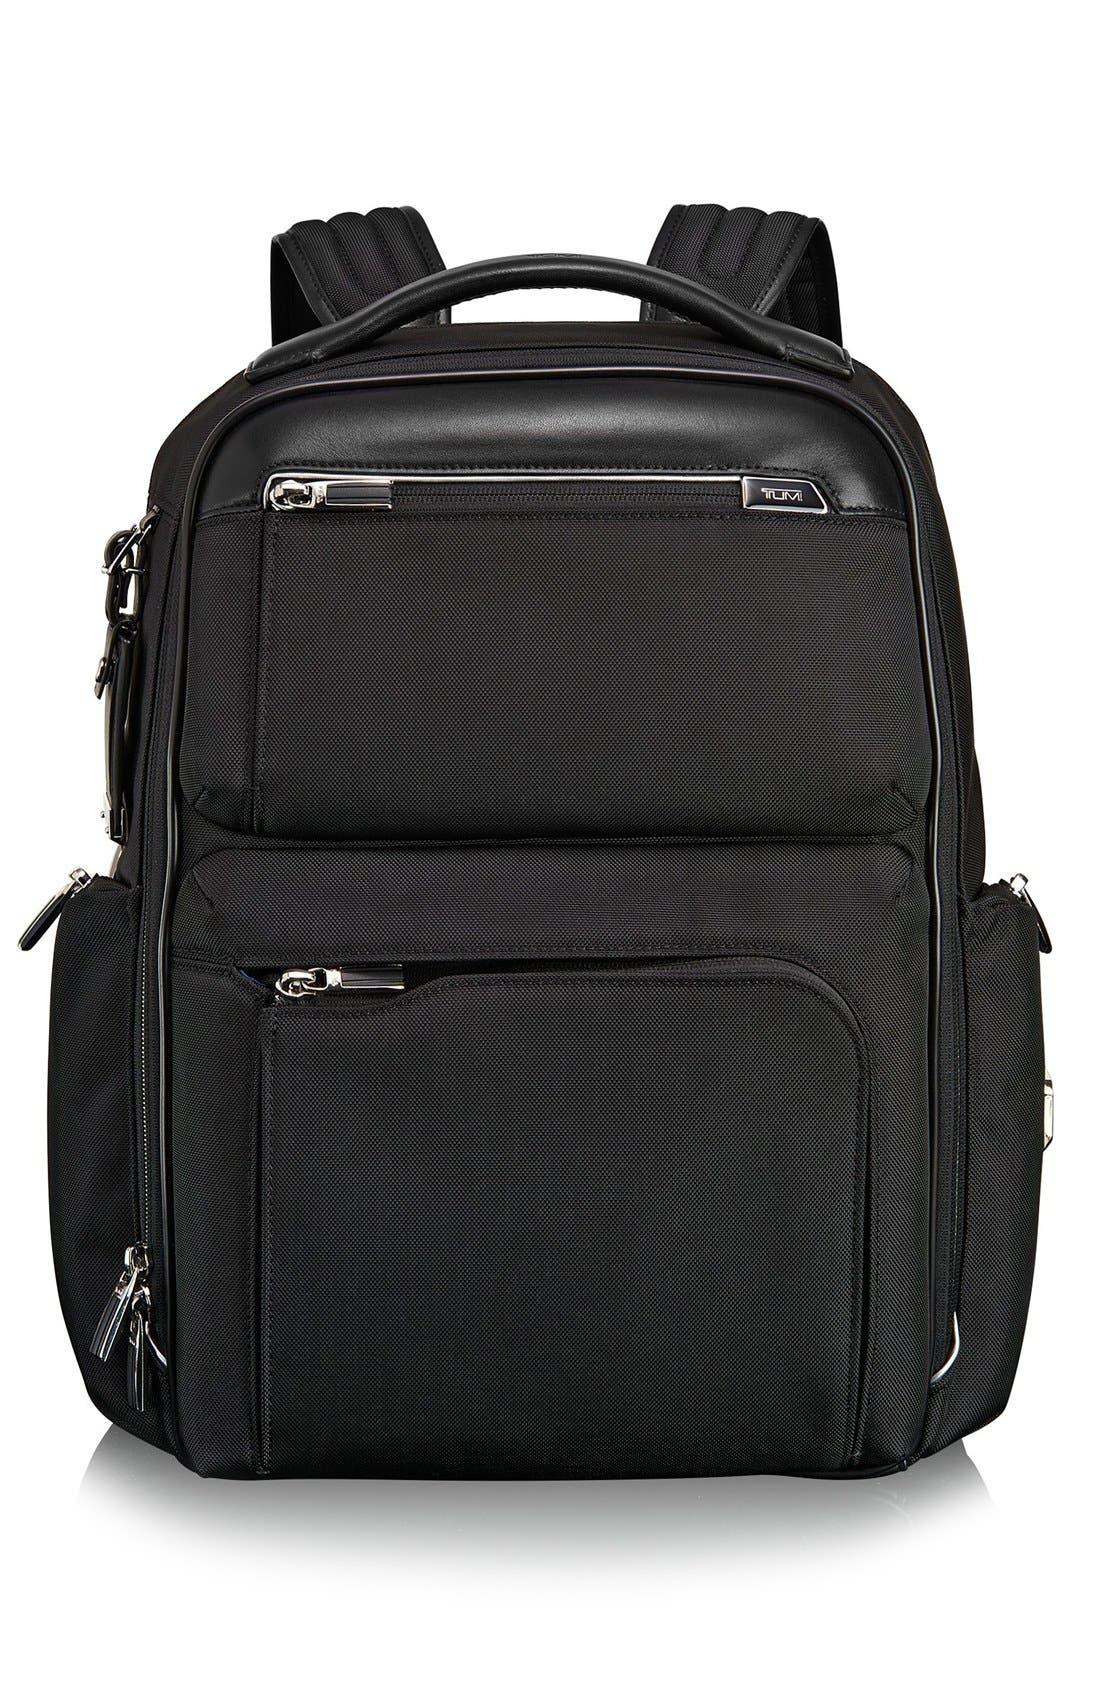 Arrivé - Bradley Backpack,                             Main thumbnail 1, color,                             Black